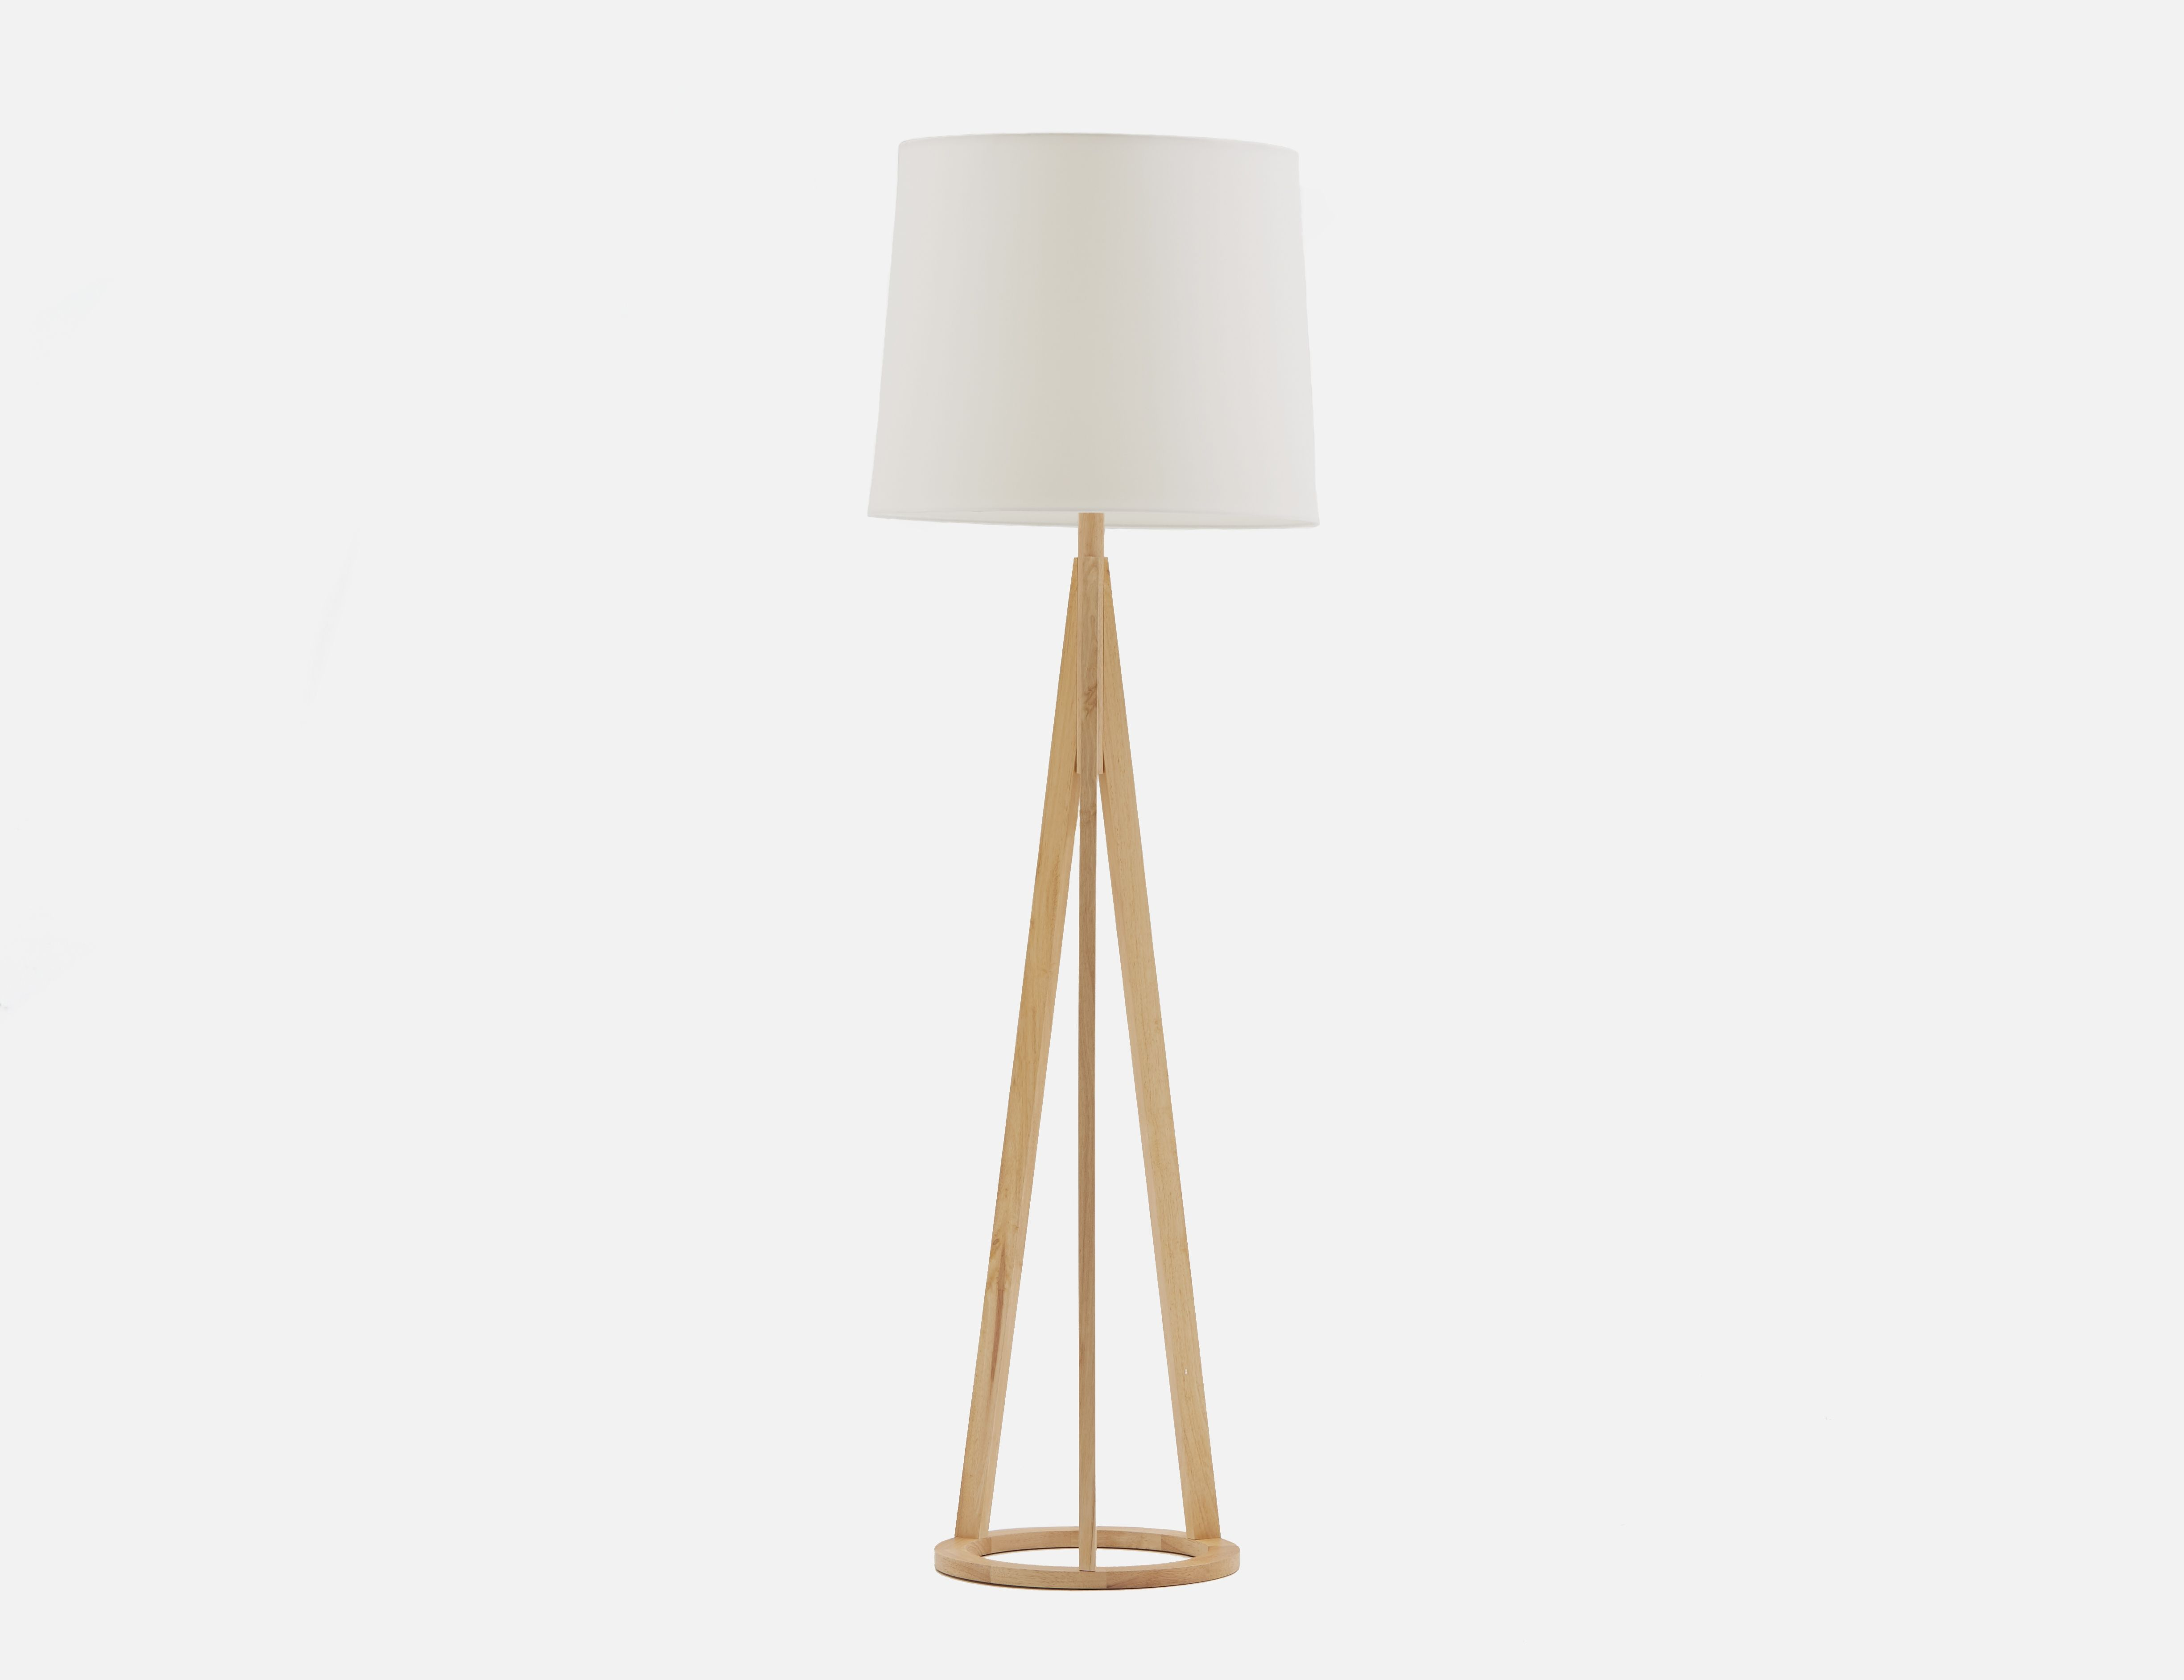 Bimini White And Natural Floor Lamp 160cm Height Structu Natural Floor Lamps Adjustable